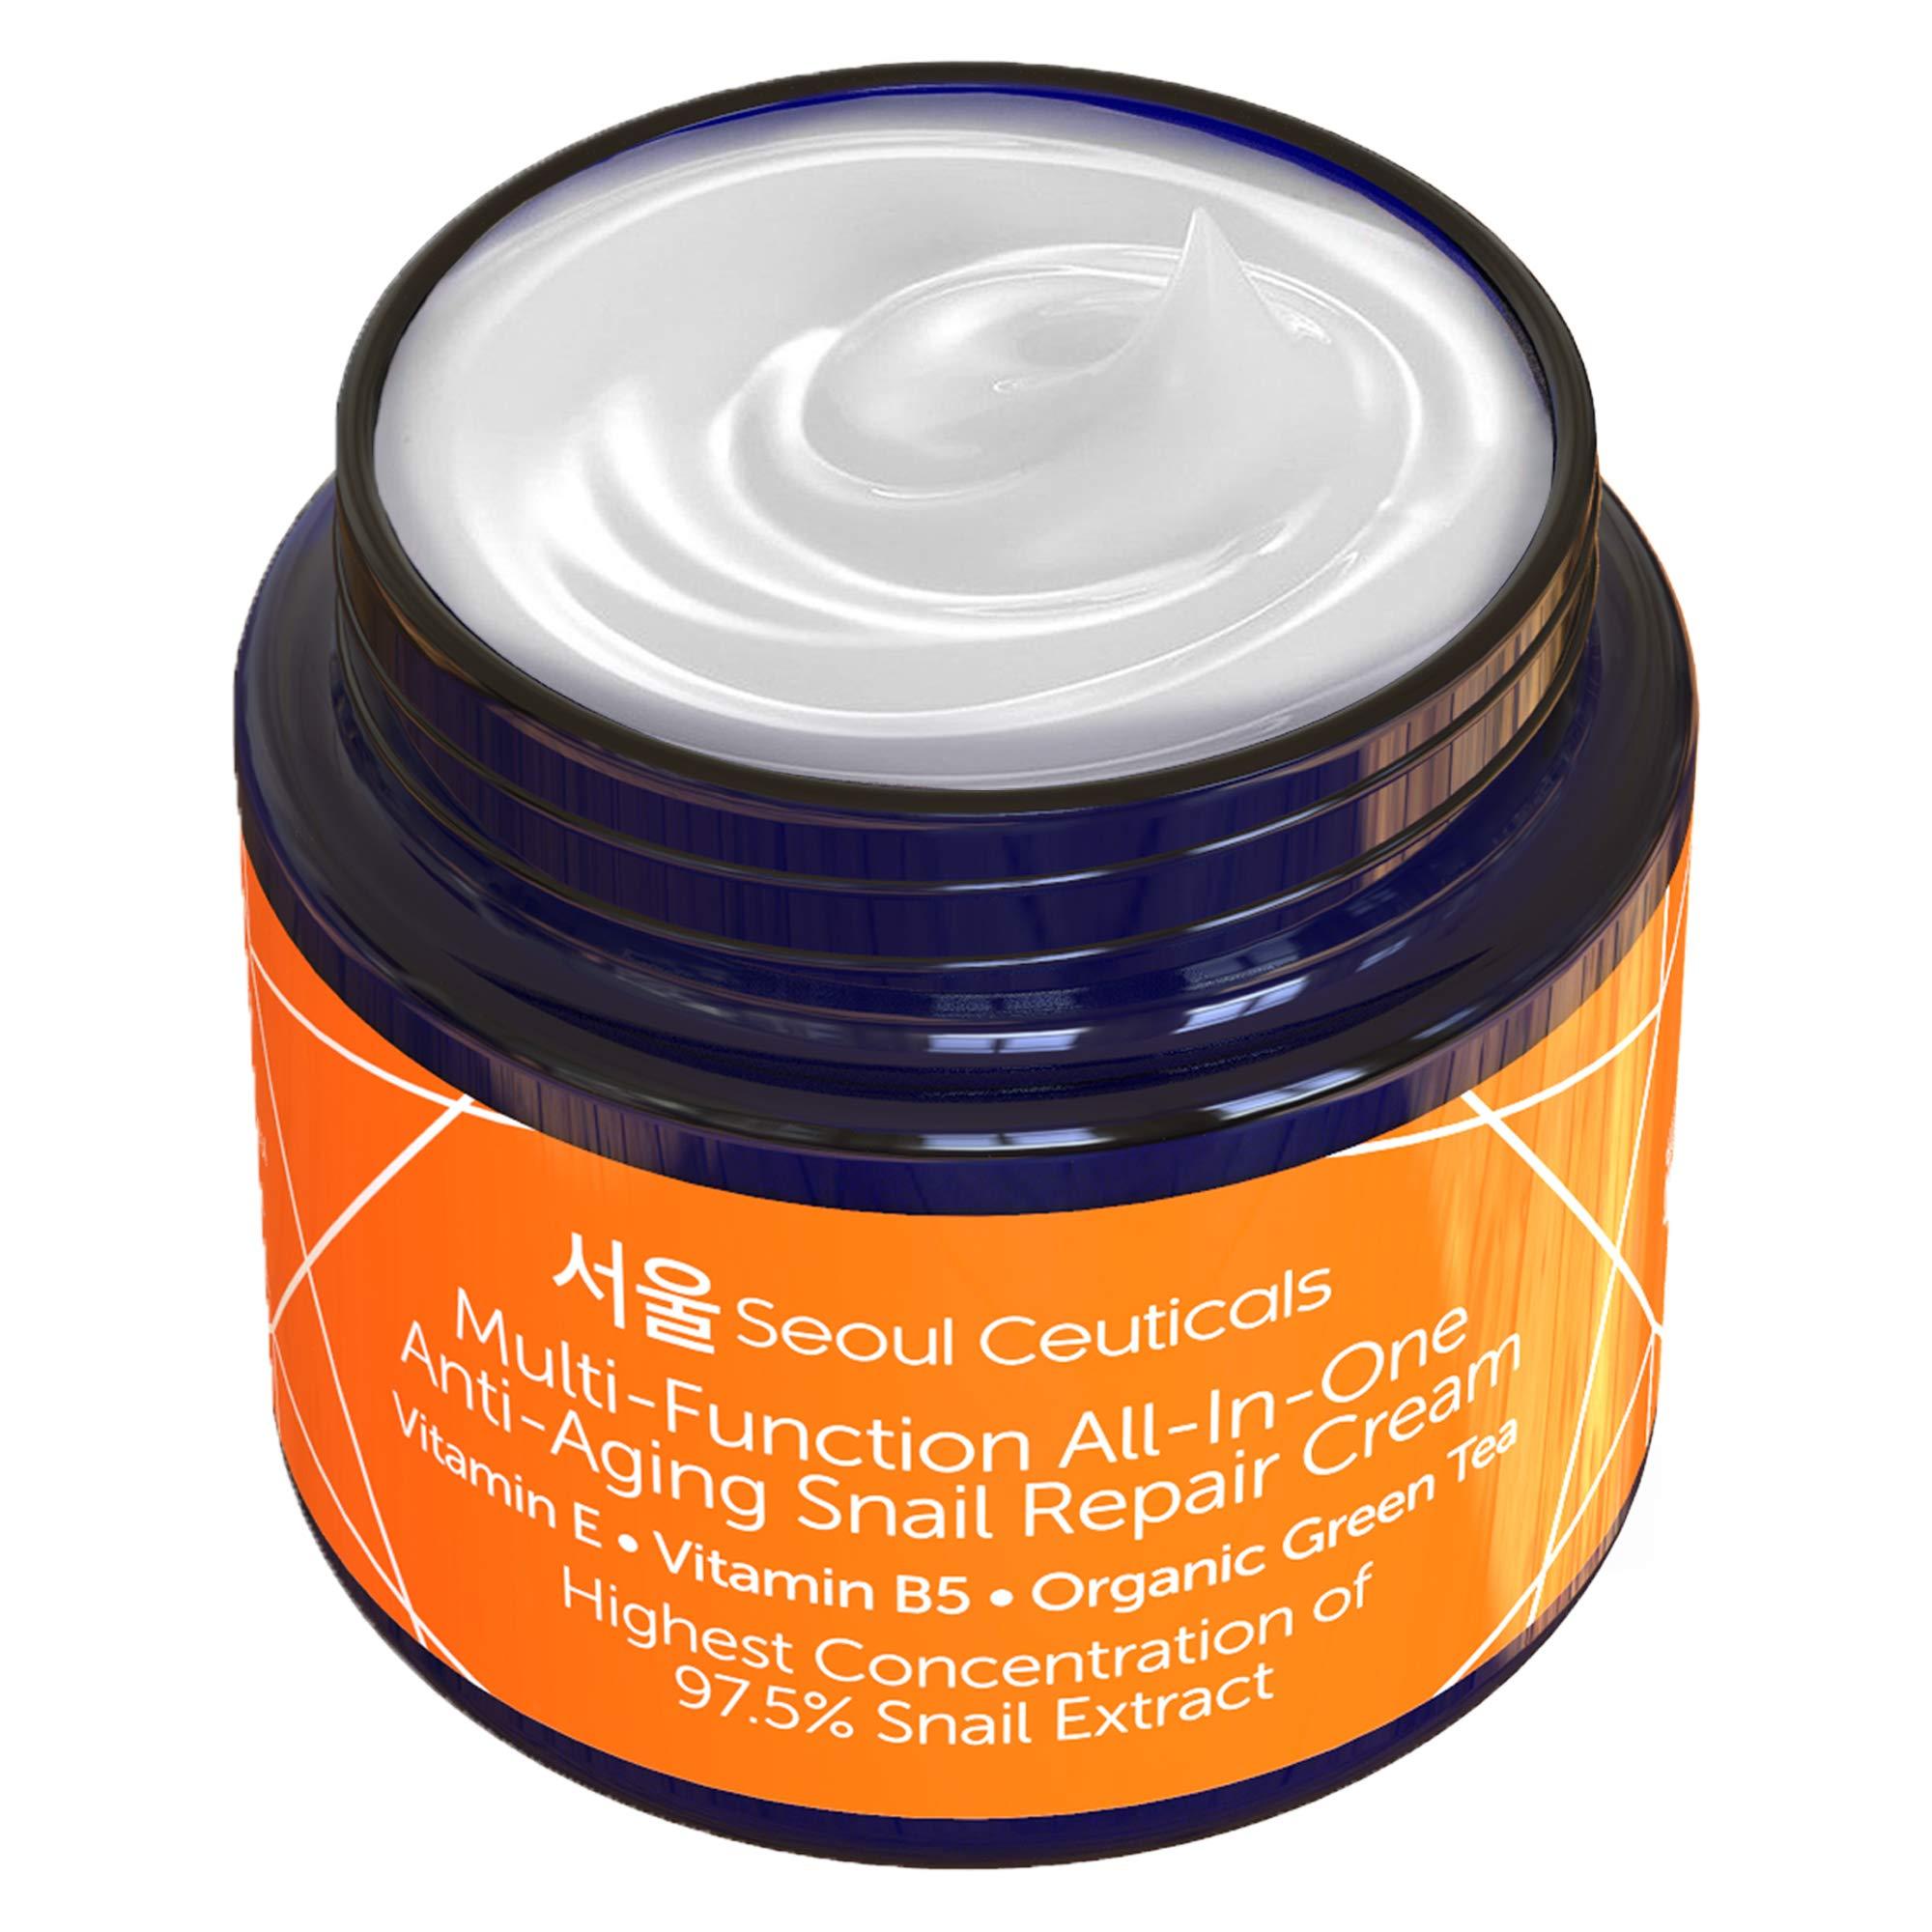 Korean Snail Repair Cream Moisturizer